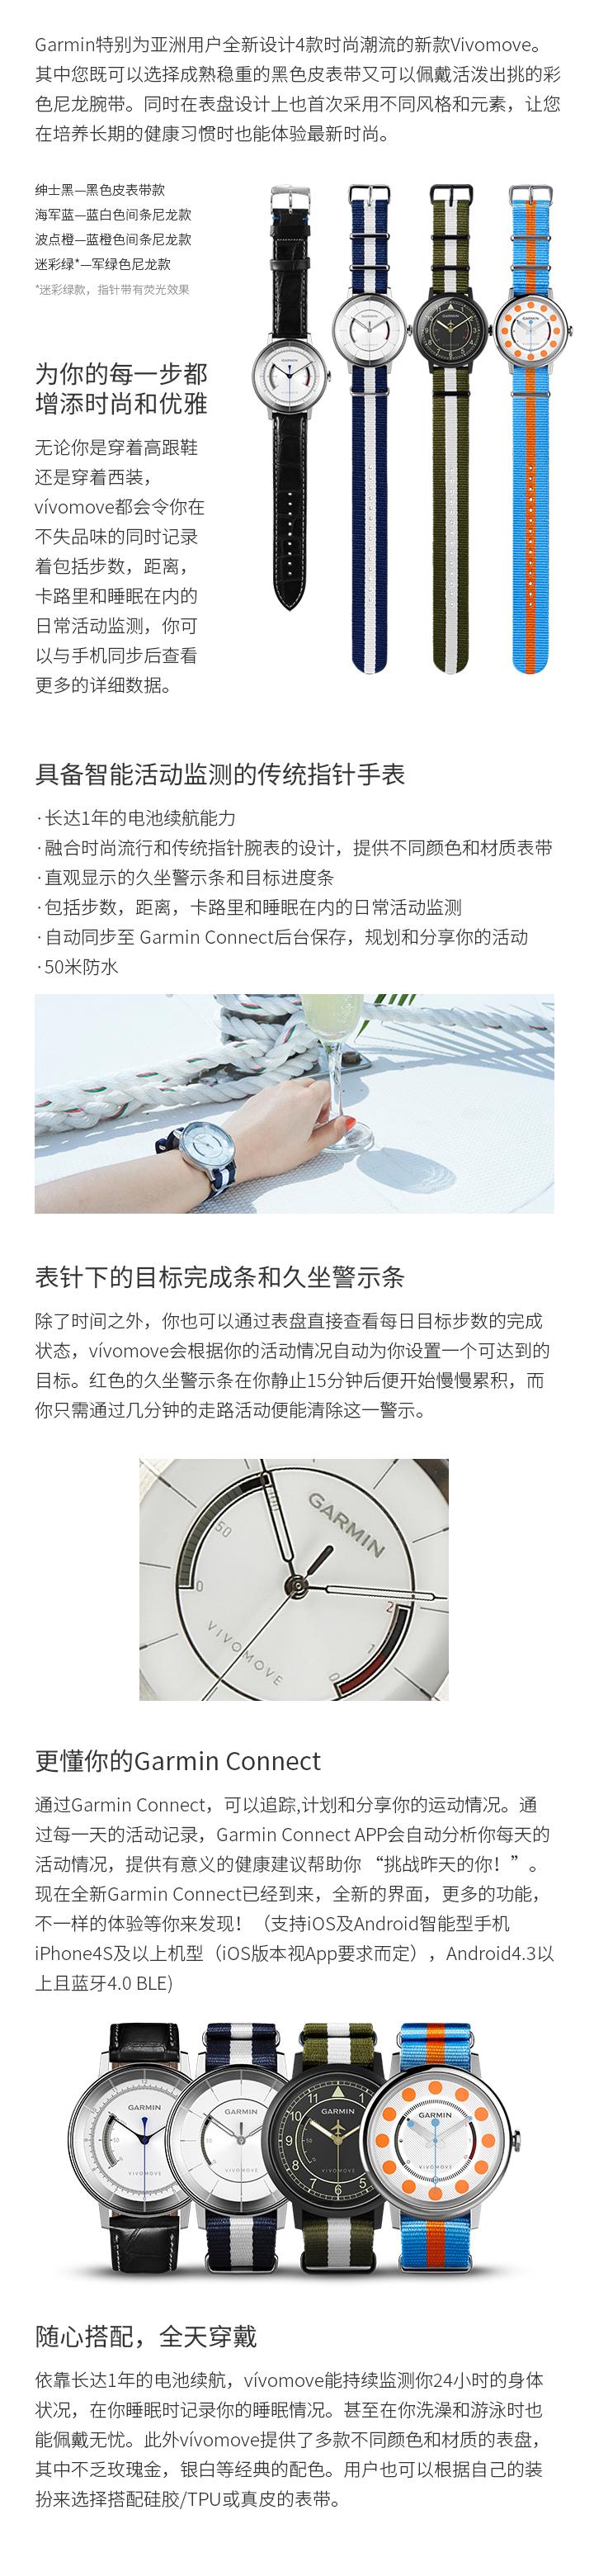 vivomove亚洲版智能腕表免费试用,评测